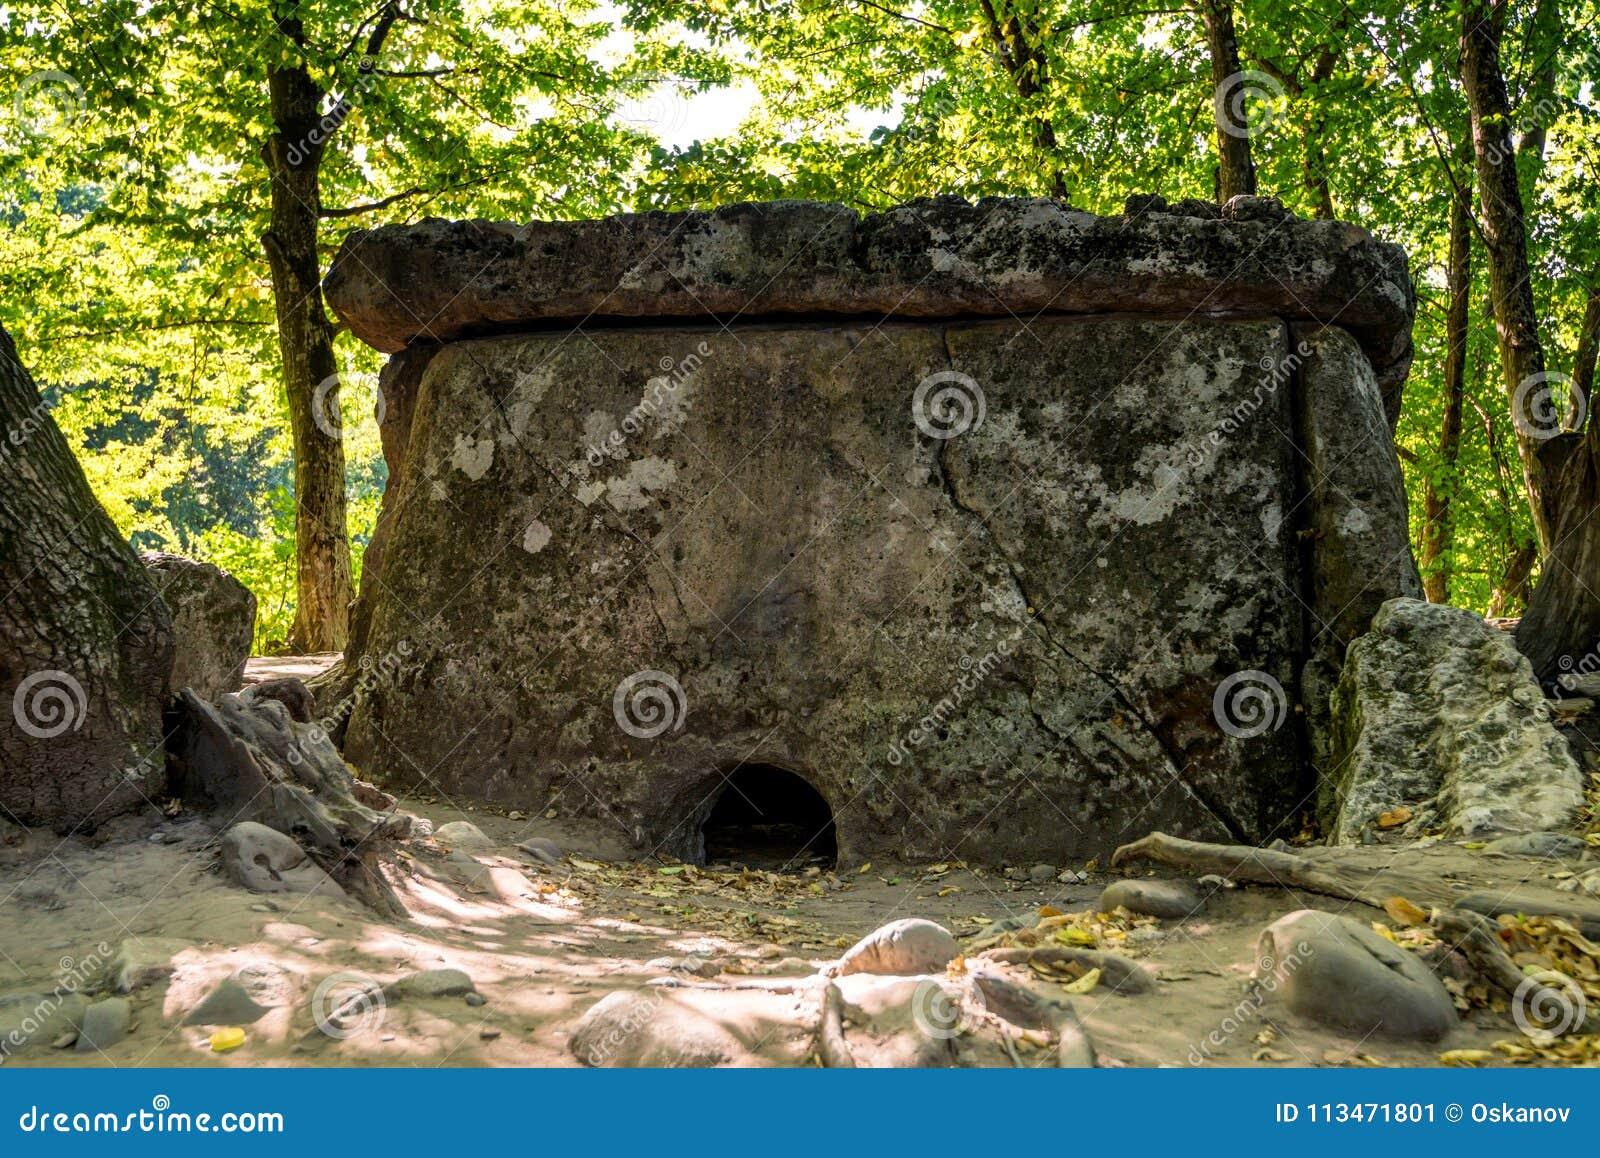 Kaukaz dolmen w lesie